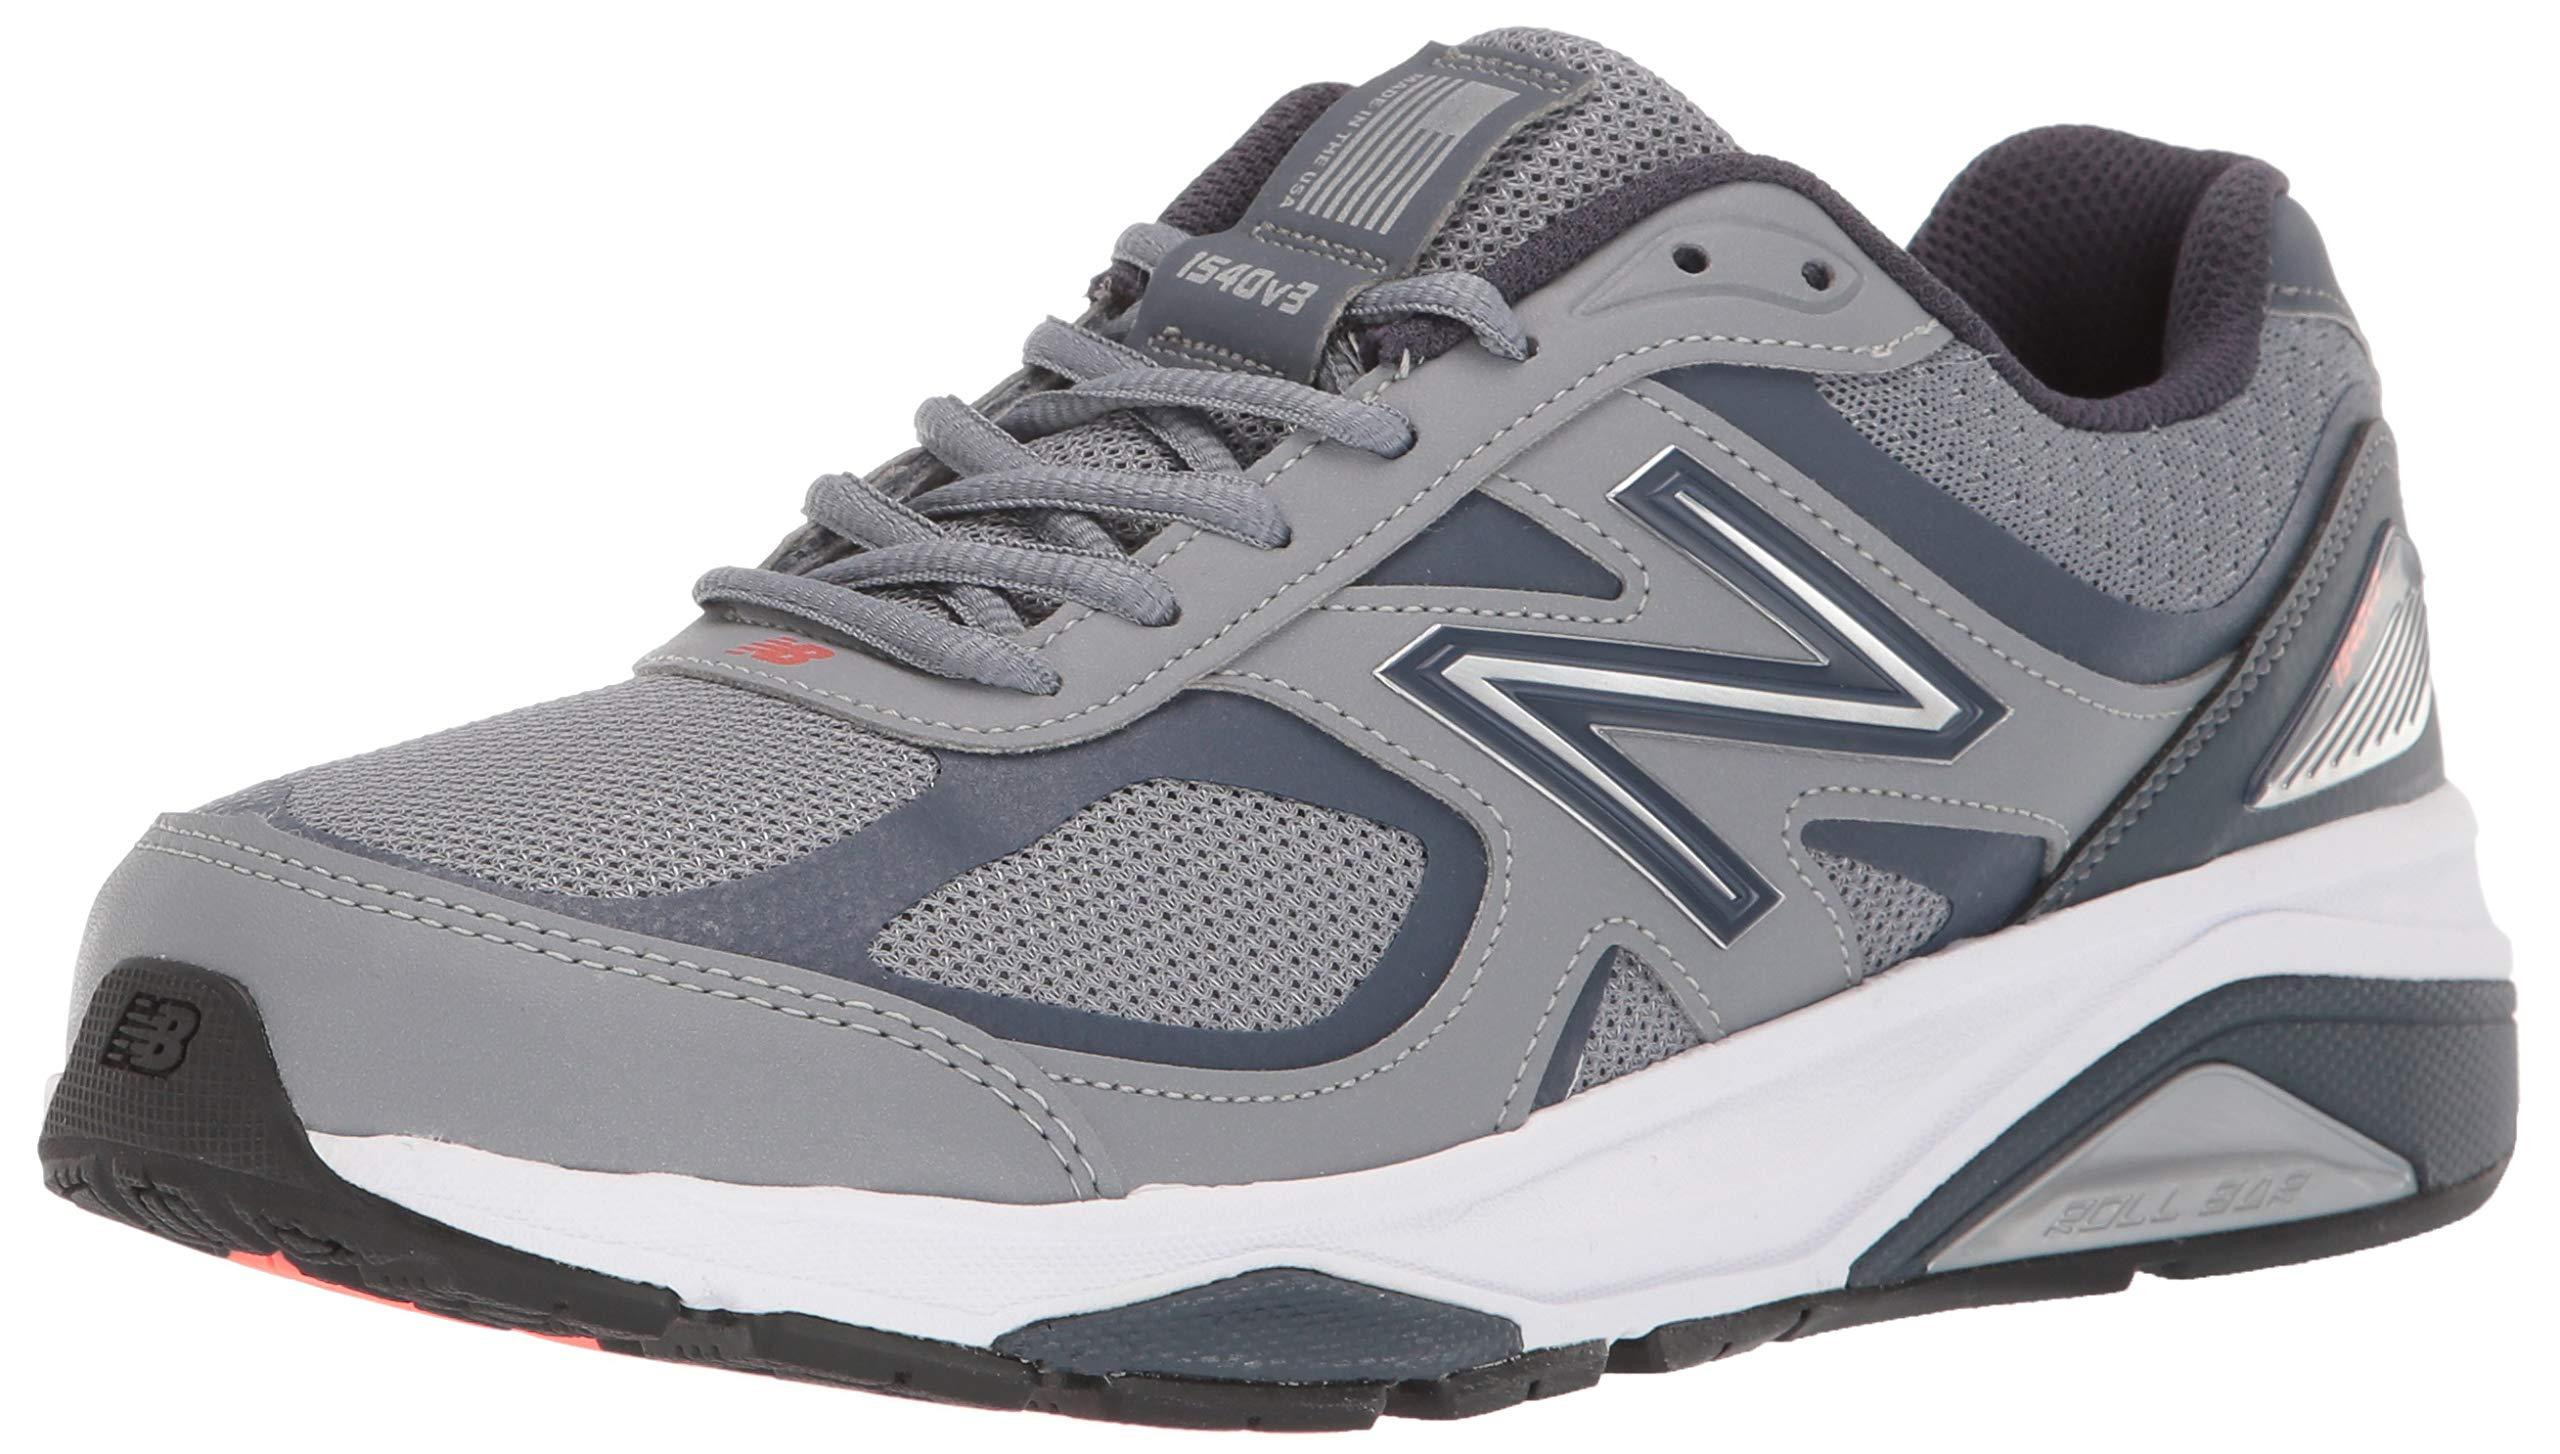 New Balance Women's 1540v3 Running Shoe, Gunmetal/Dragonfly, 5 M US